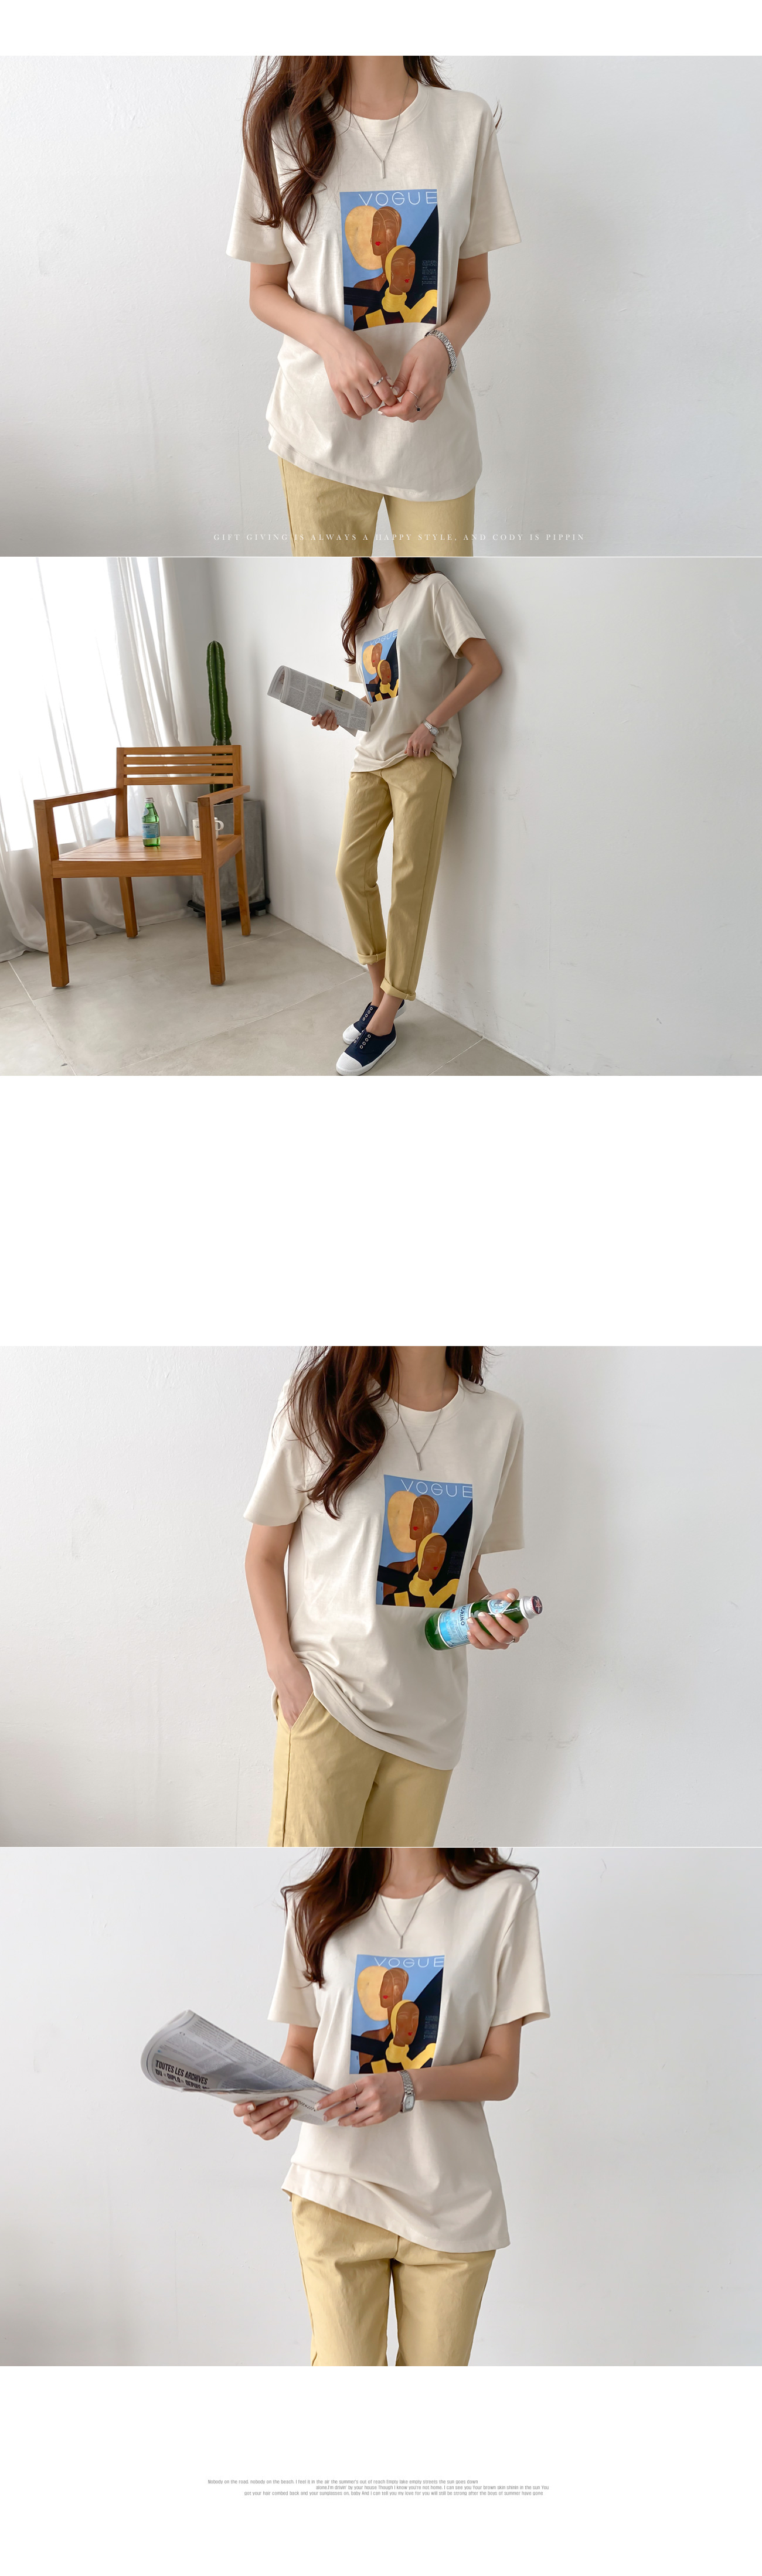 Art printing short sleeve t-shirt #108008